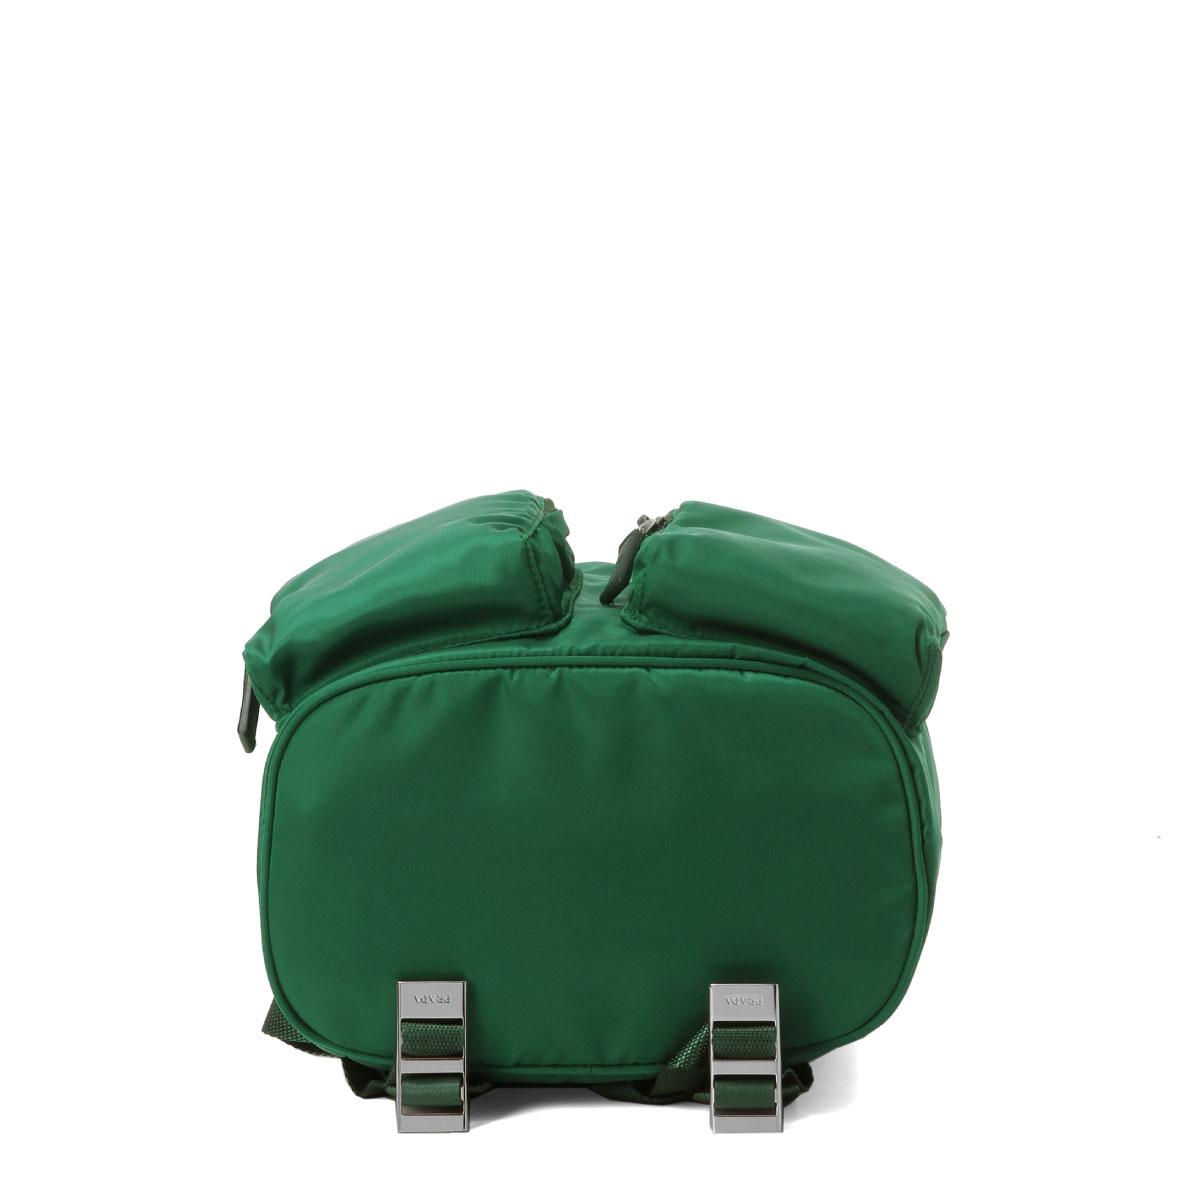 importshopdouble  Prada PRADA bag lady 1BZ024 V44 F0571 backpack ... ca7e5b2b41c06